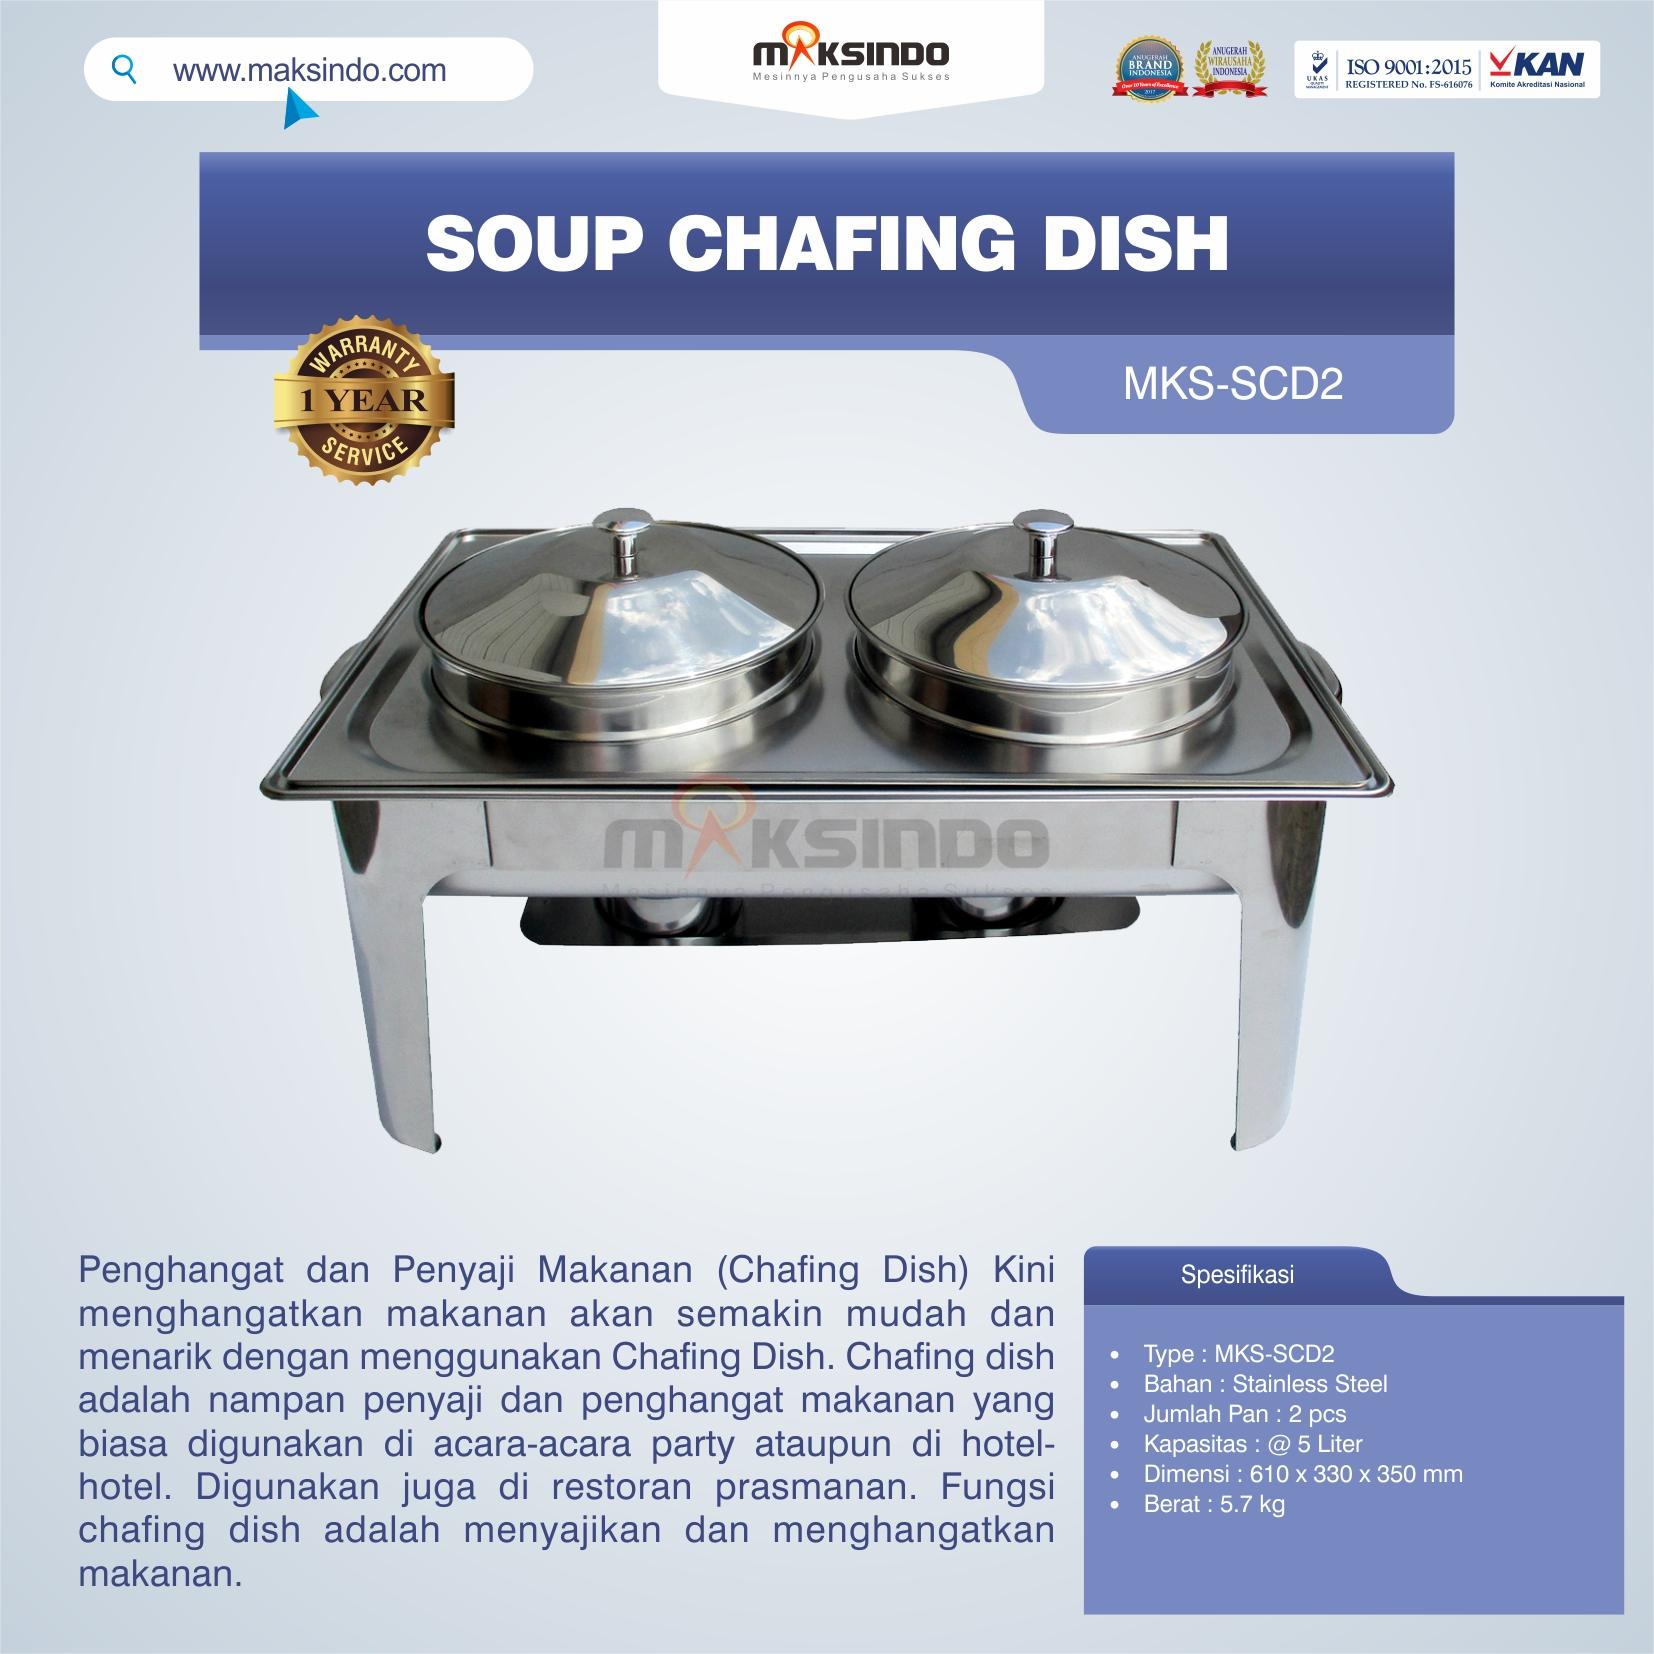 Jual Soup Chafing Dish MKS-SCD2 di Semarang